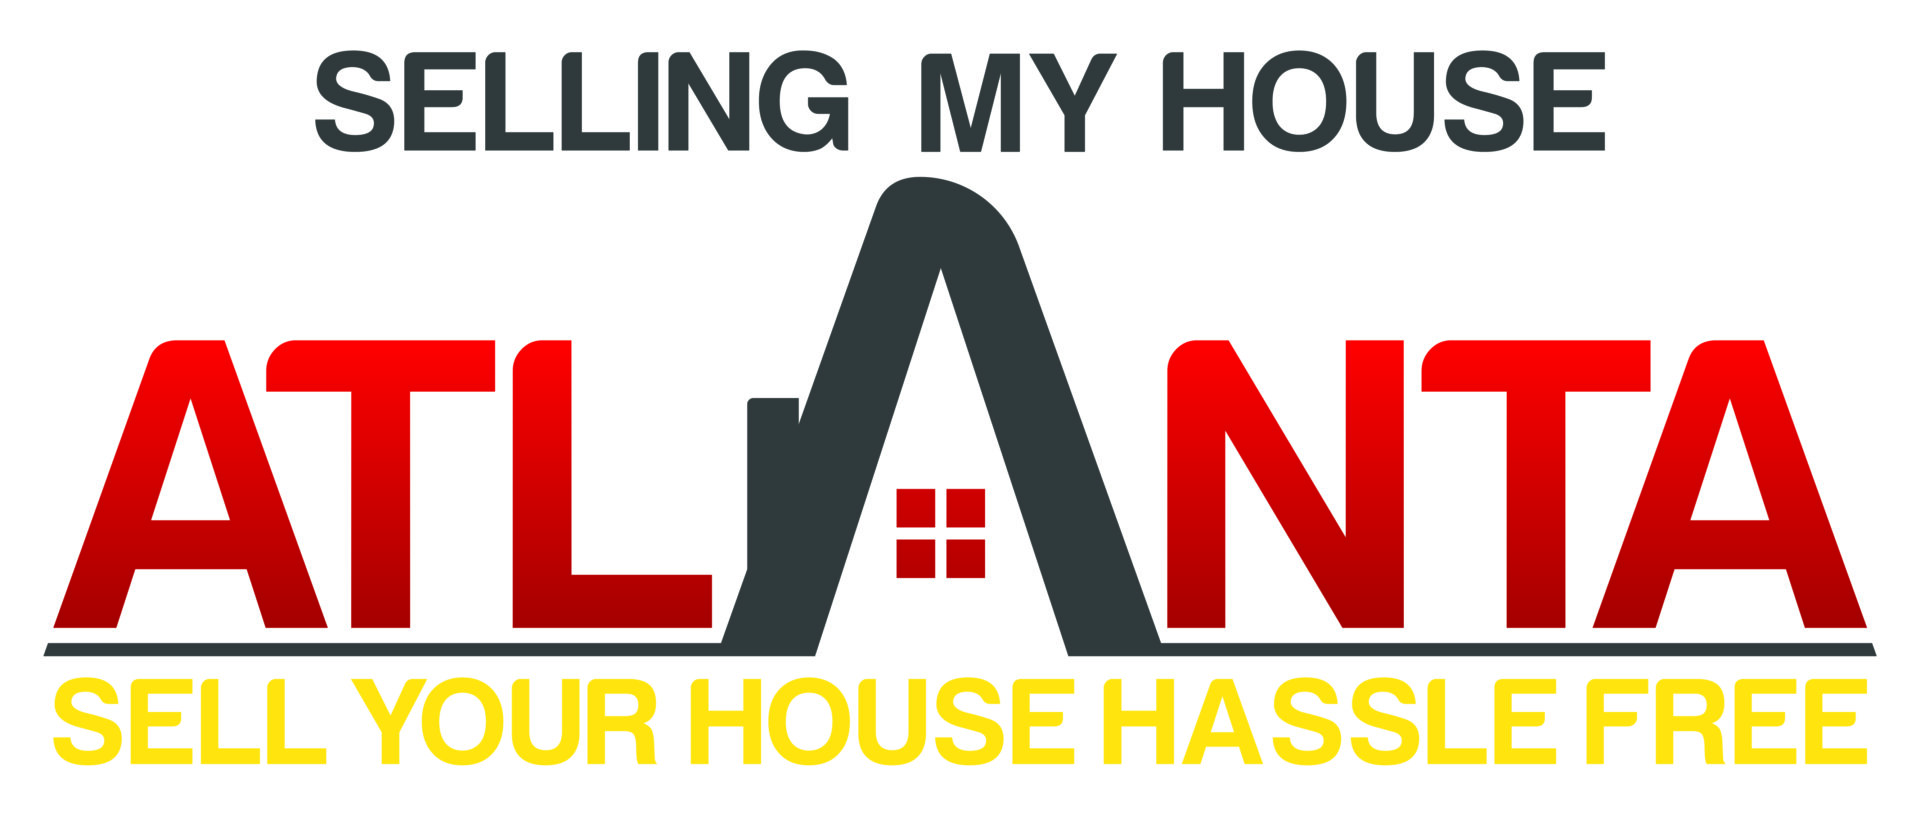 Selling My House Atlanta  logo